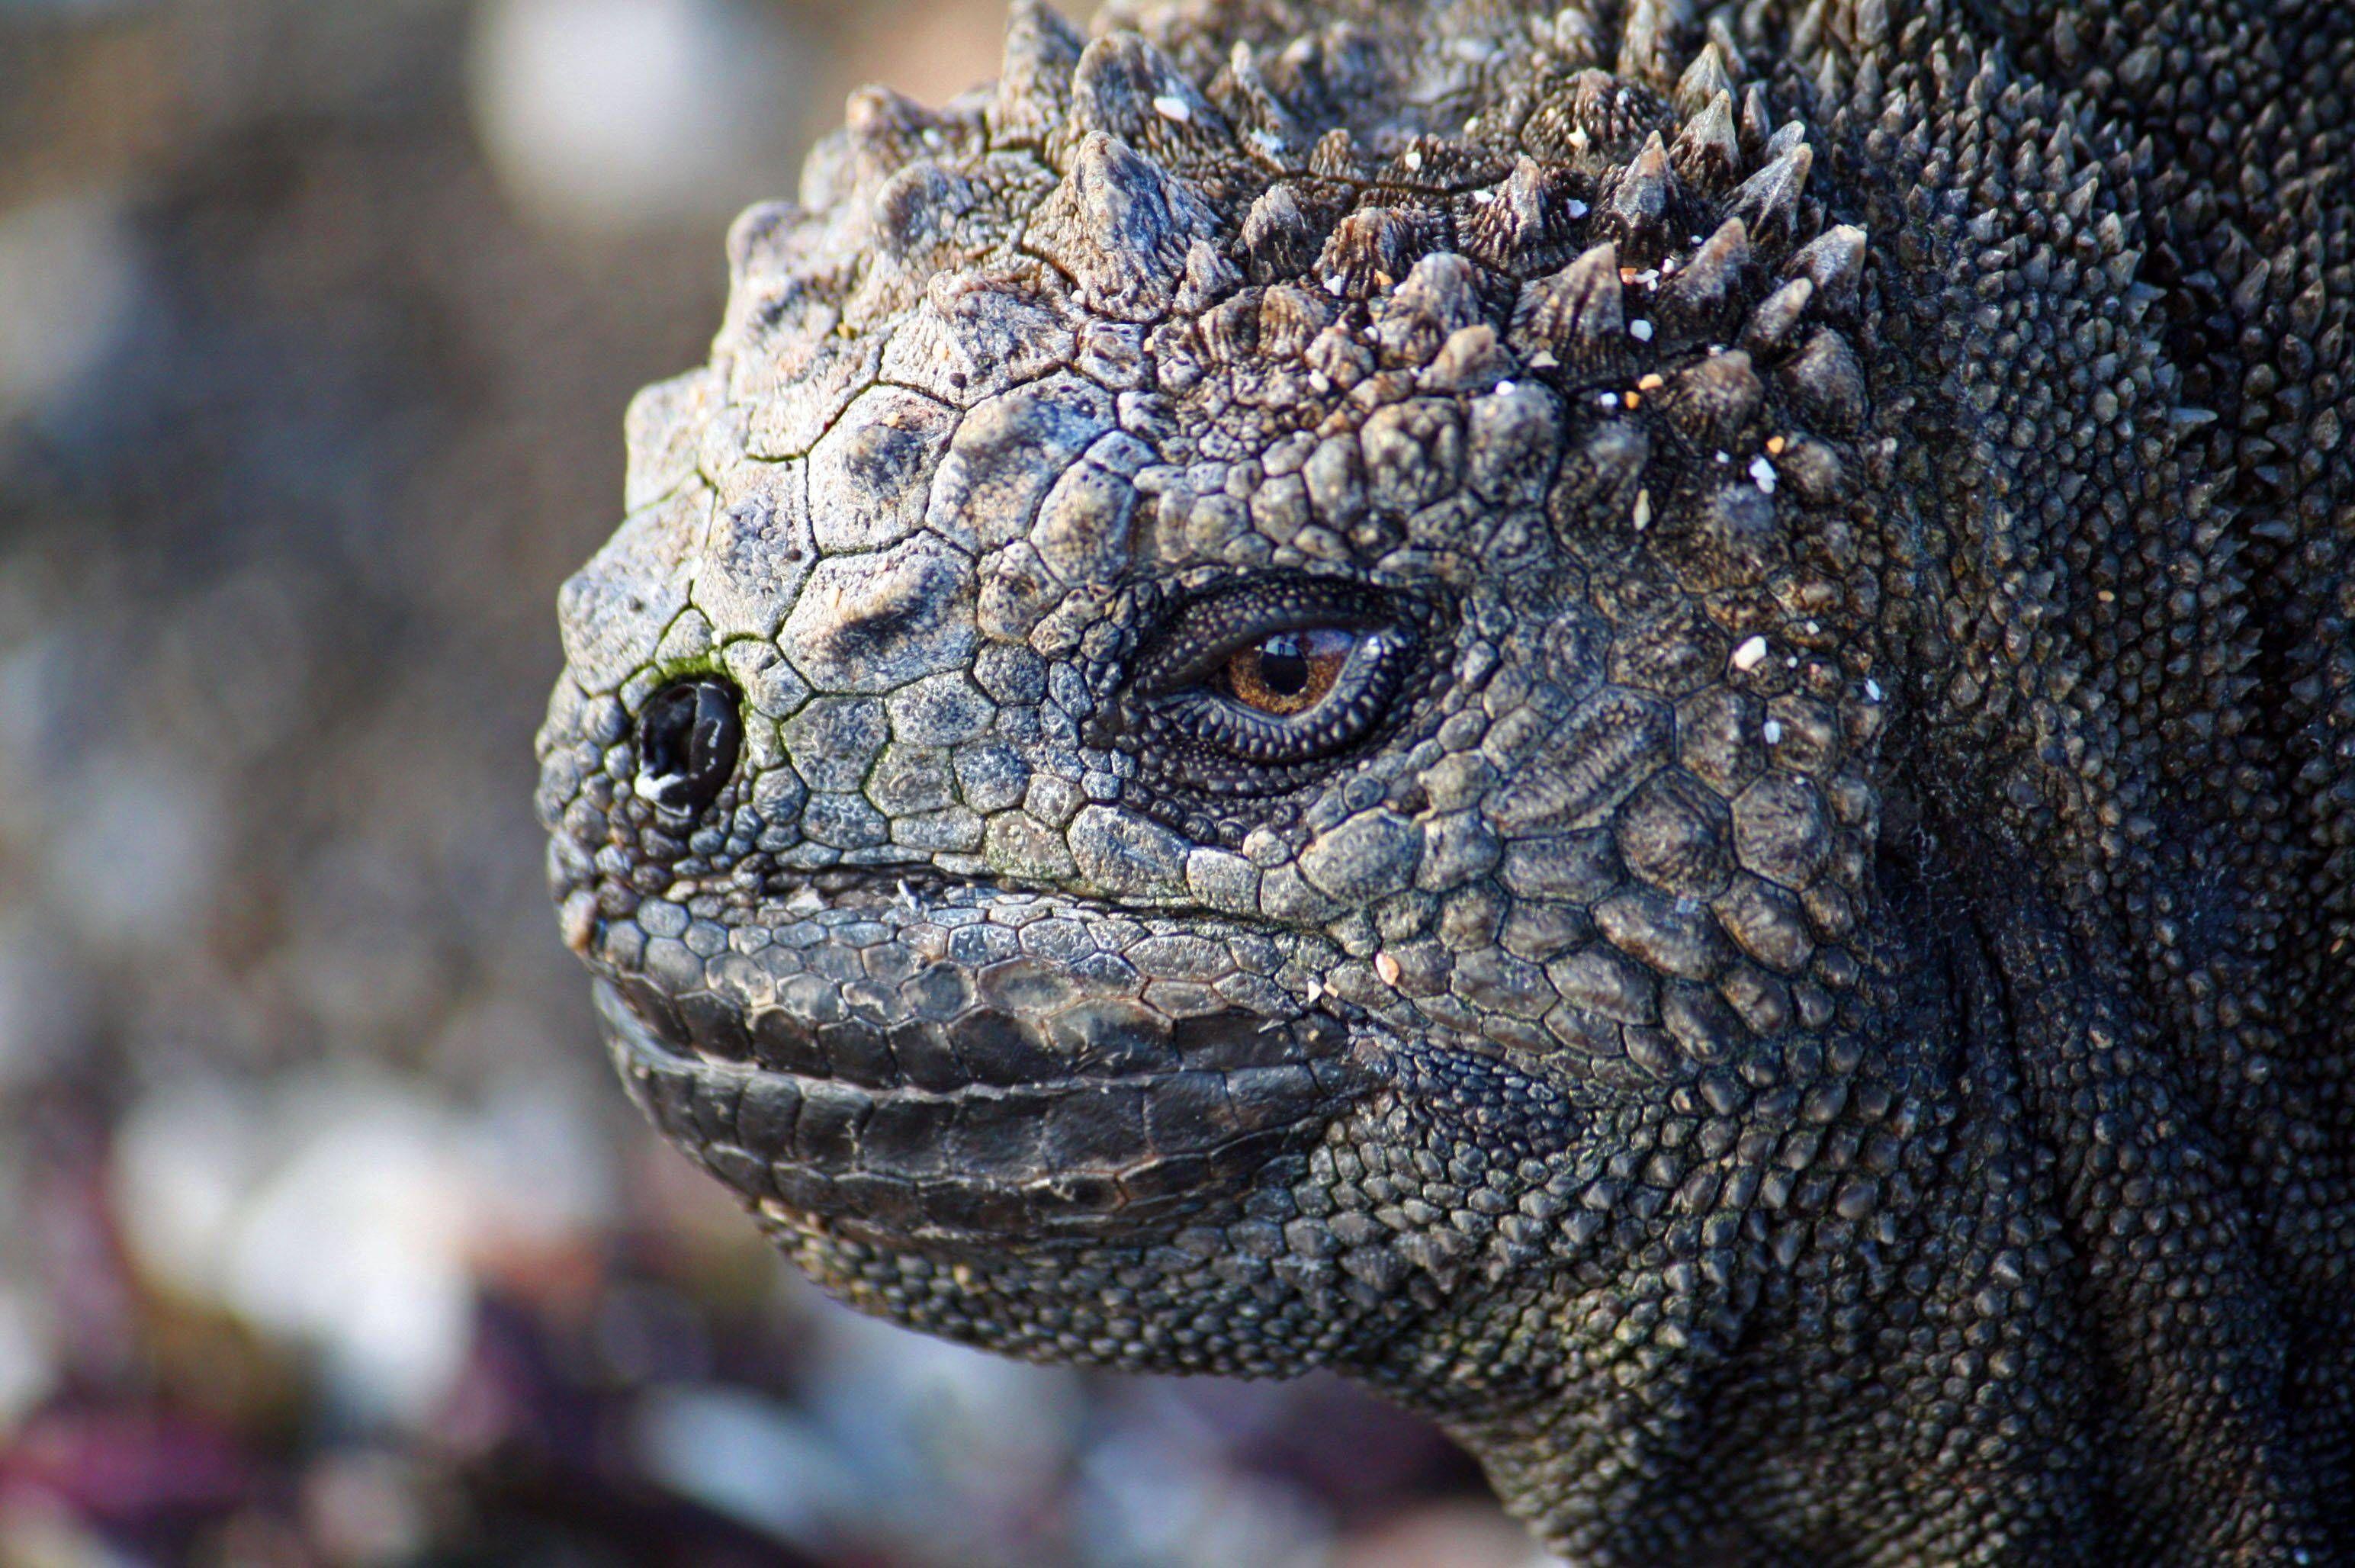 Marine Iguana from the Galapagos | Animals | Pinterest | Reptiles ...